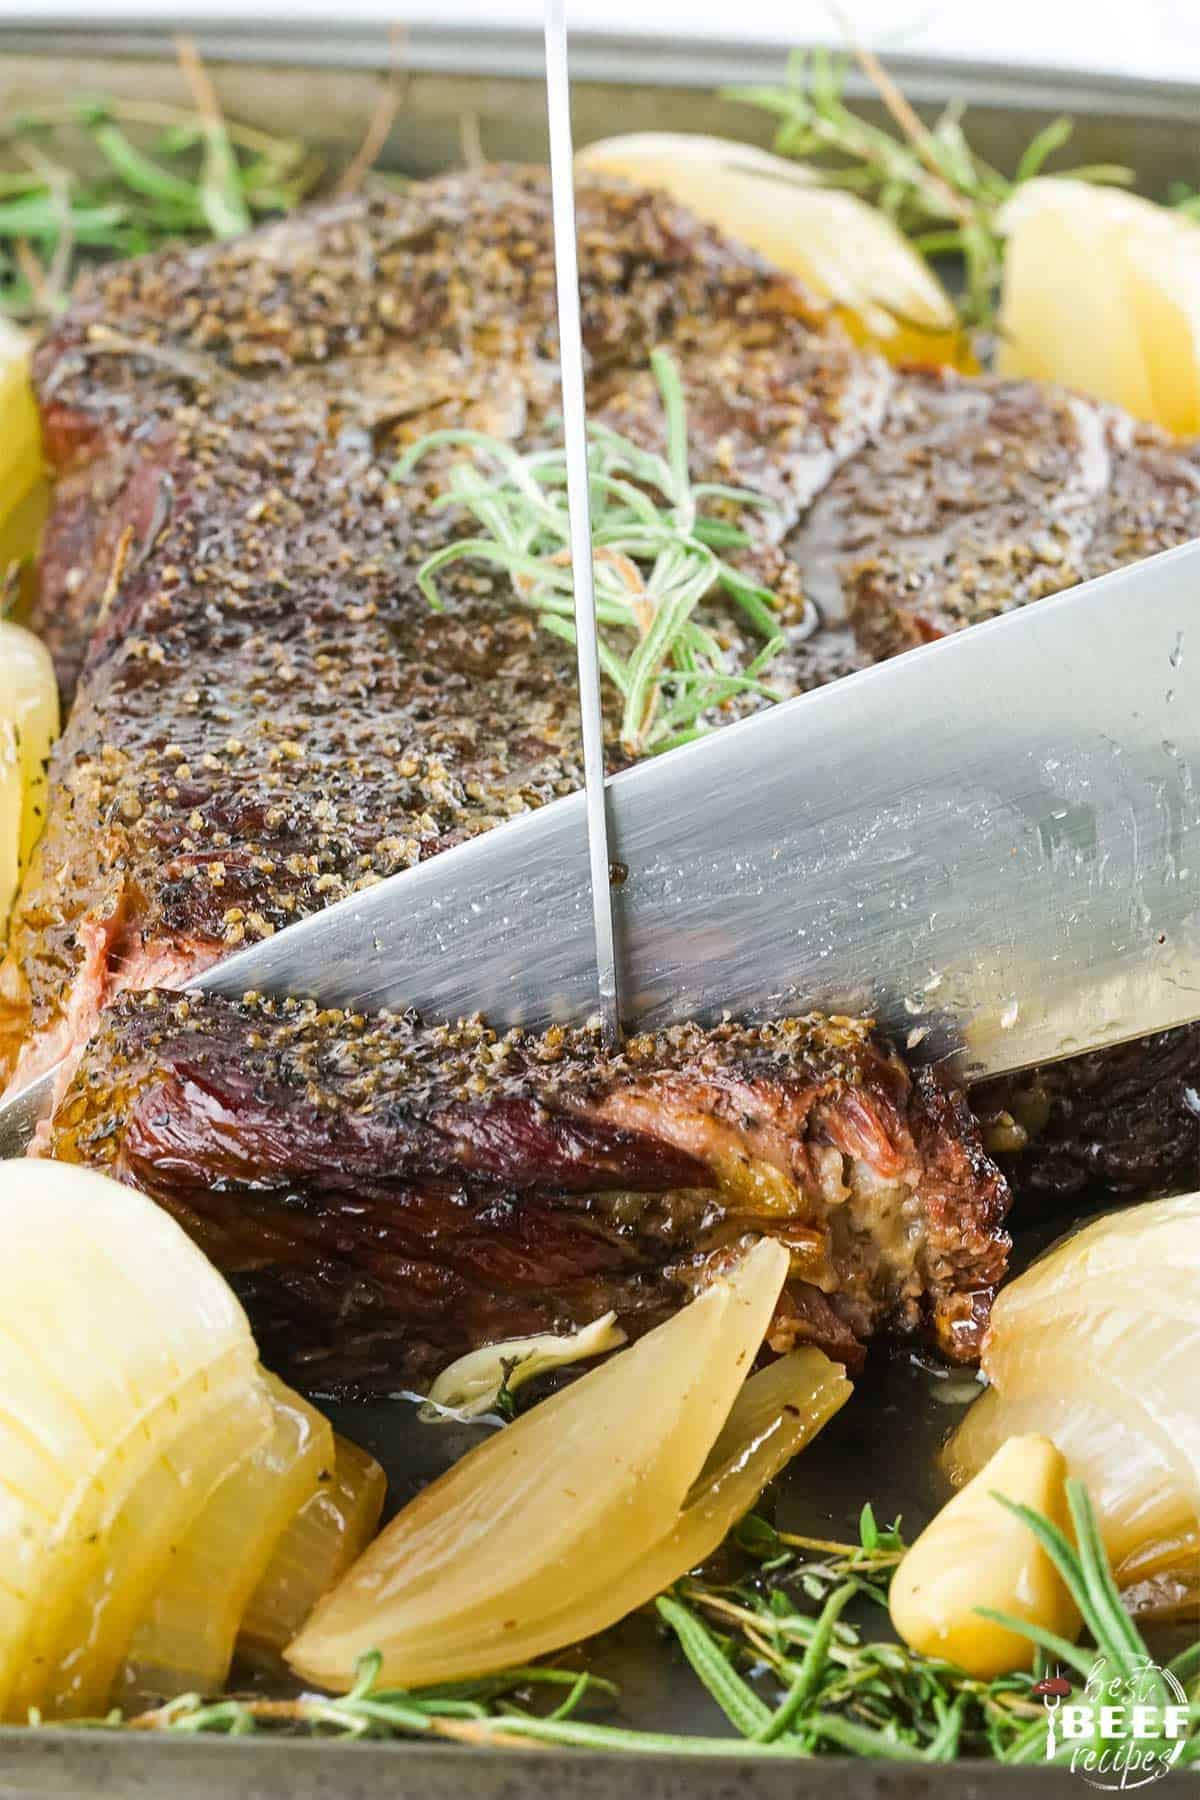 Slicing into a smoked chuck roast